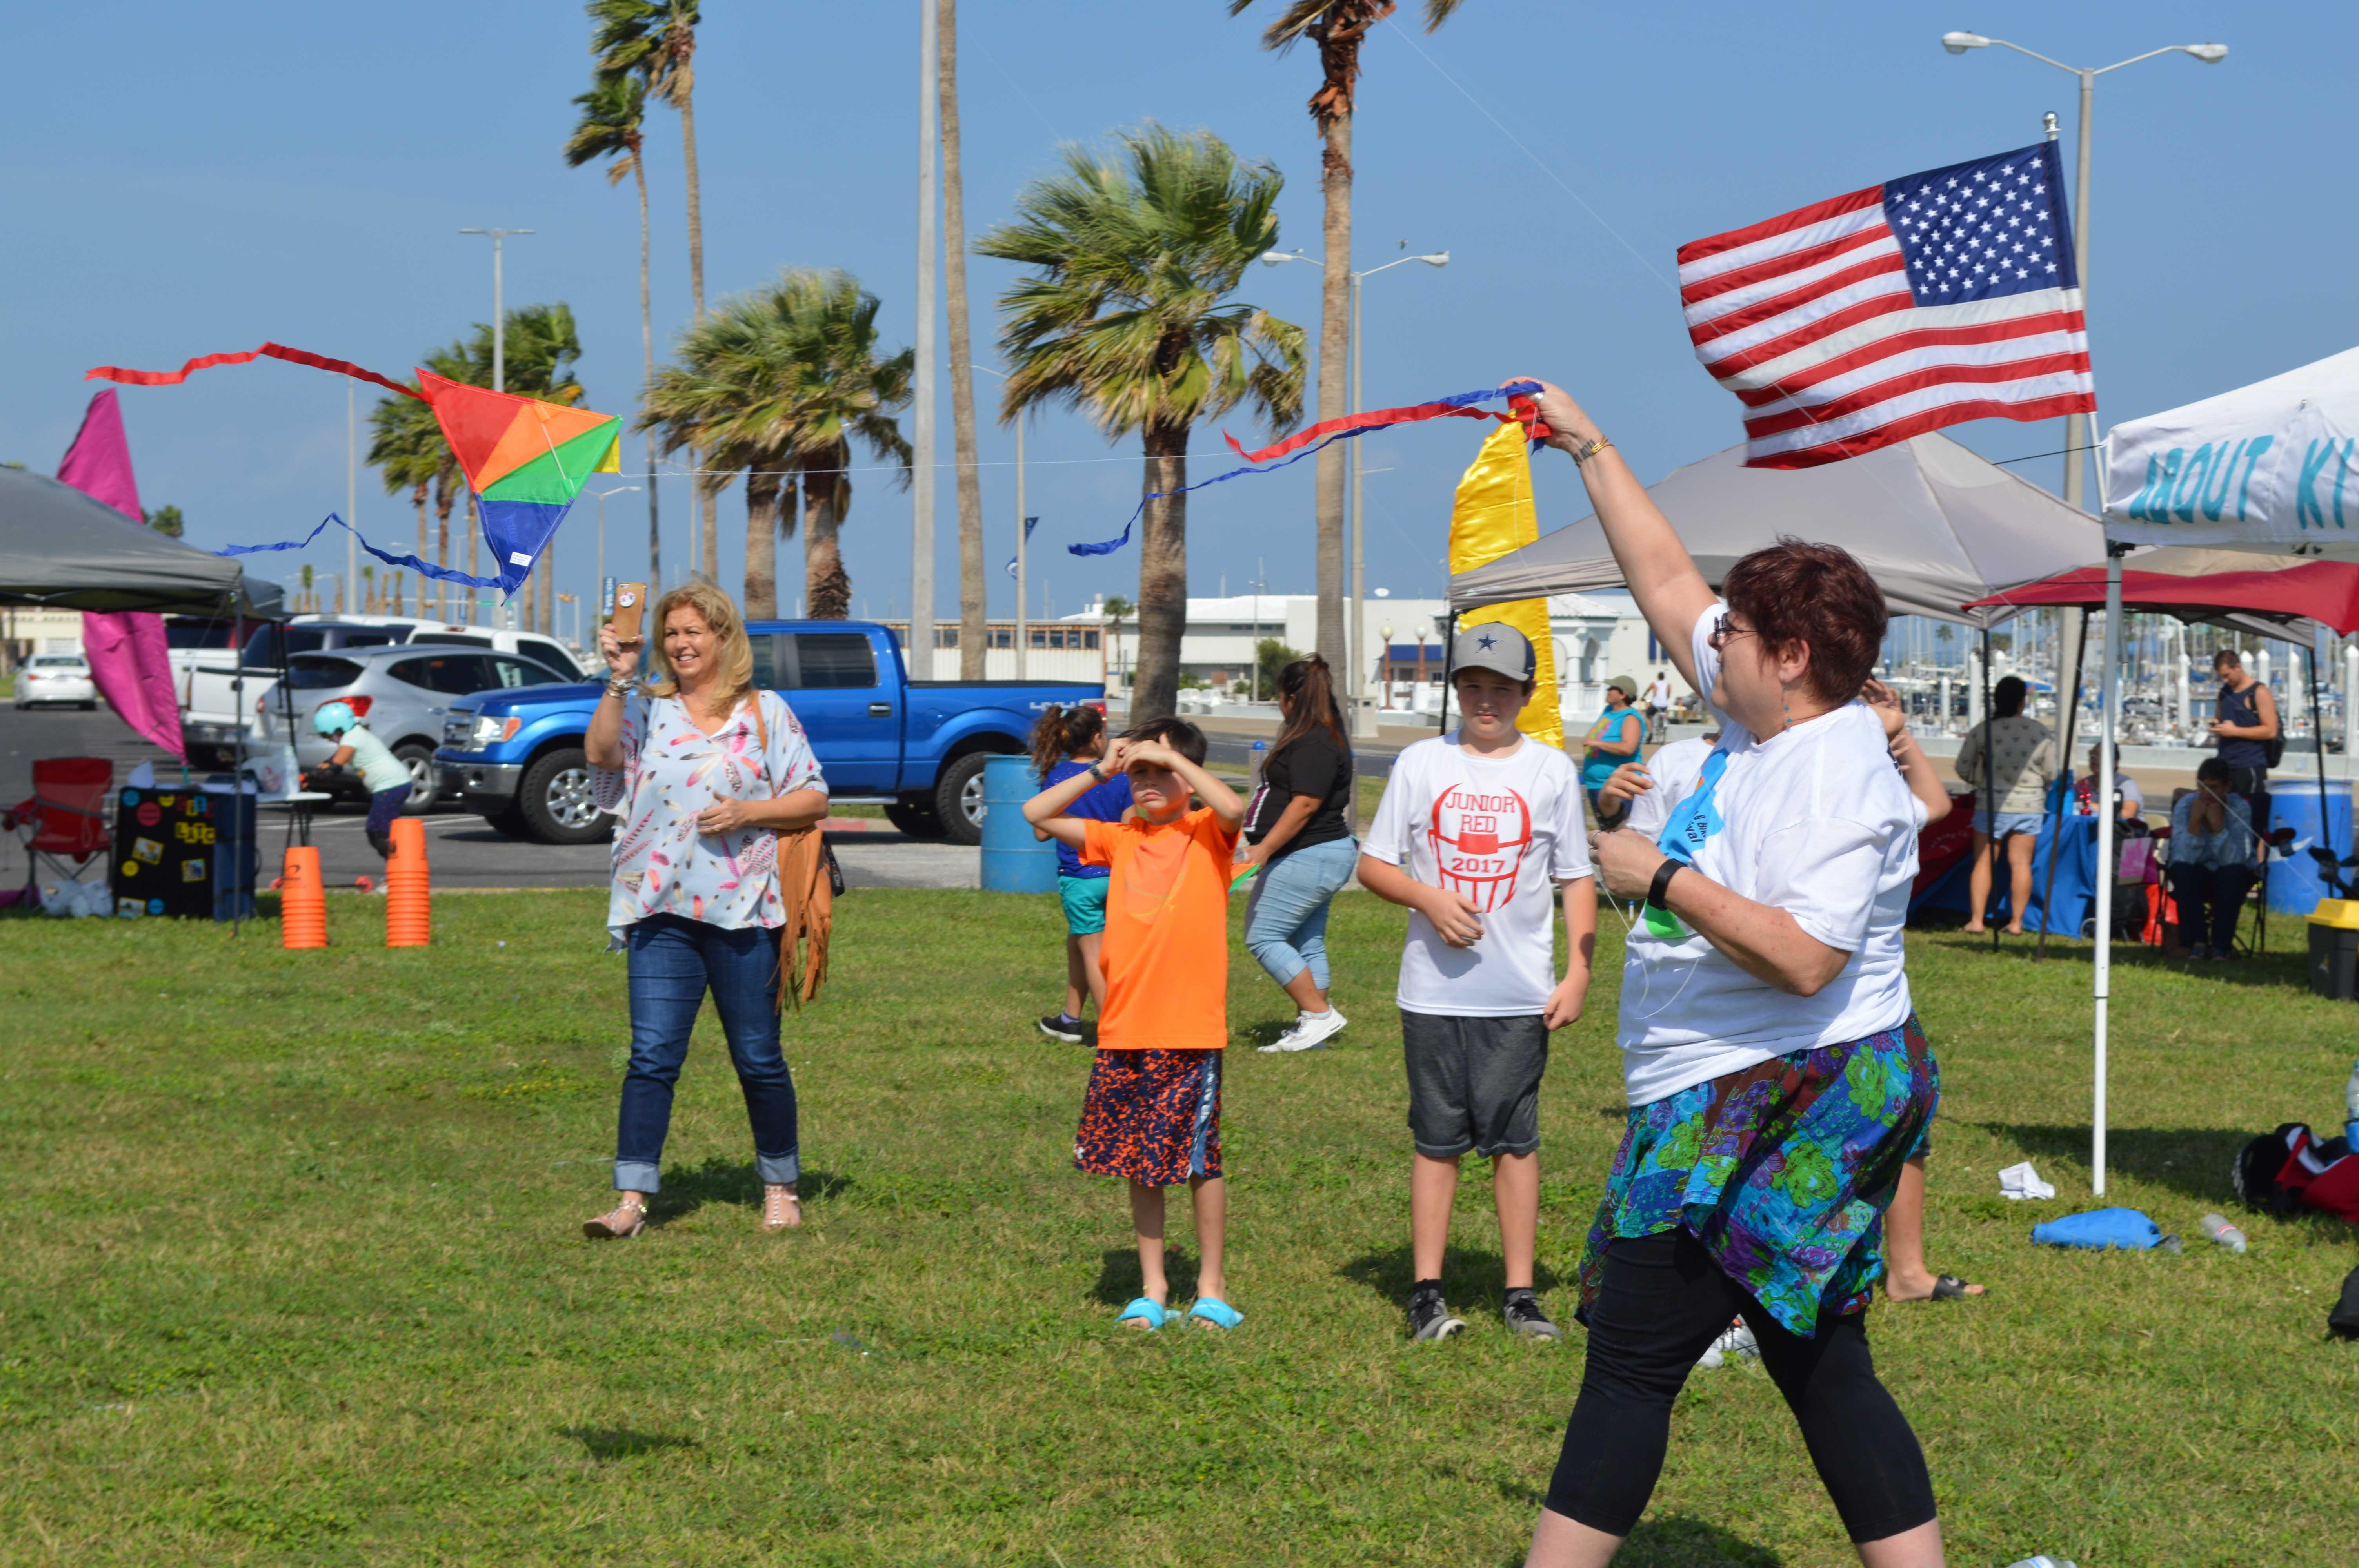 Corpus Christi Community enjoys Bike and Kite Festival